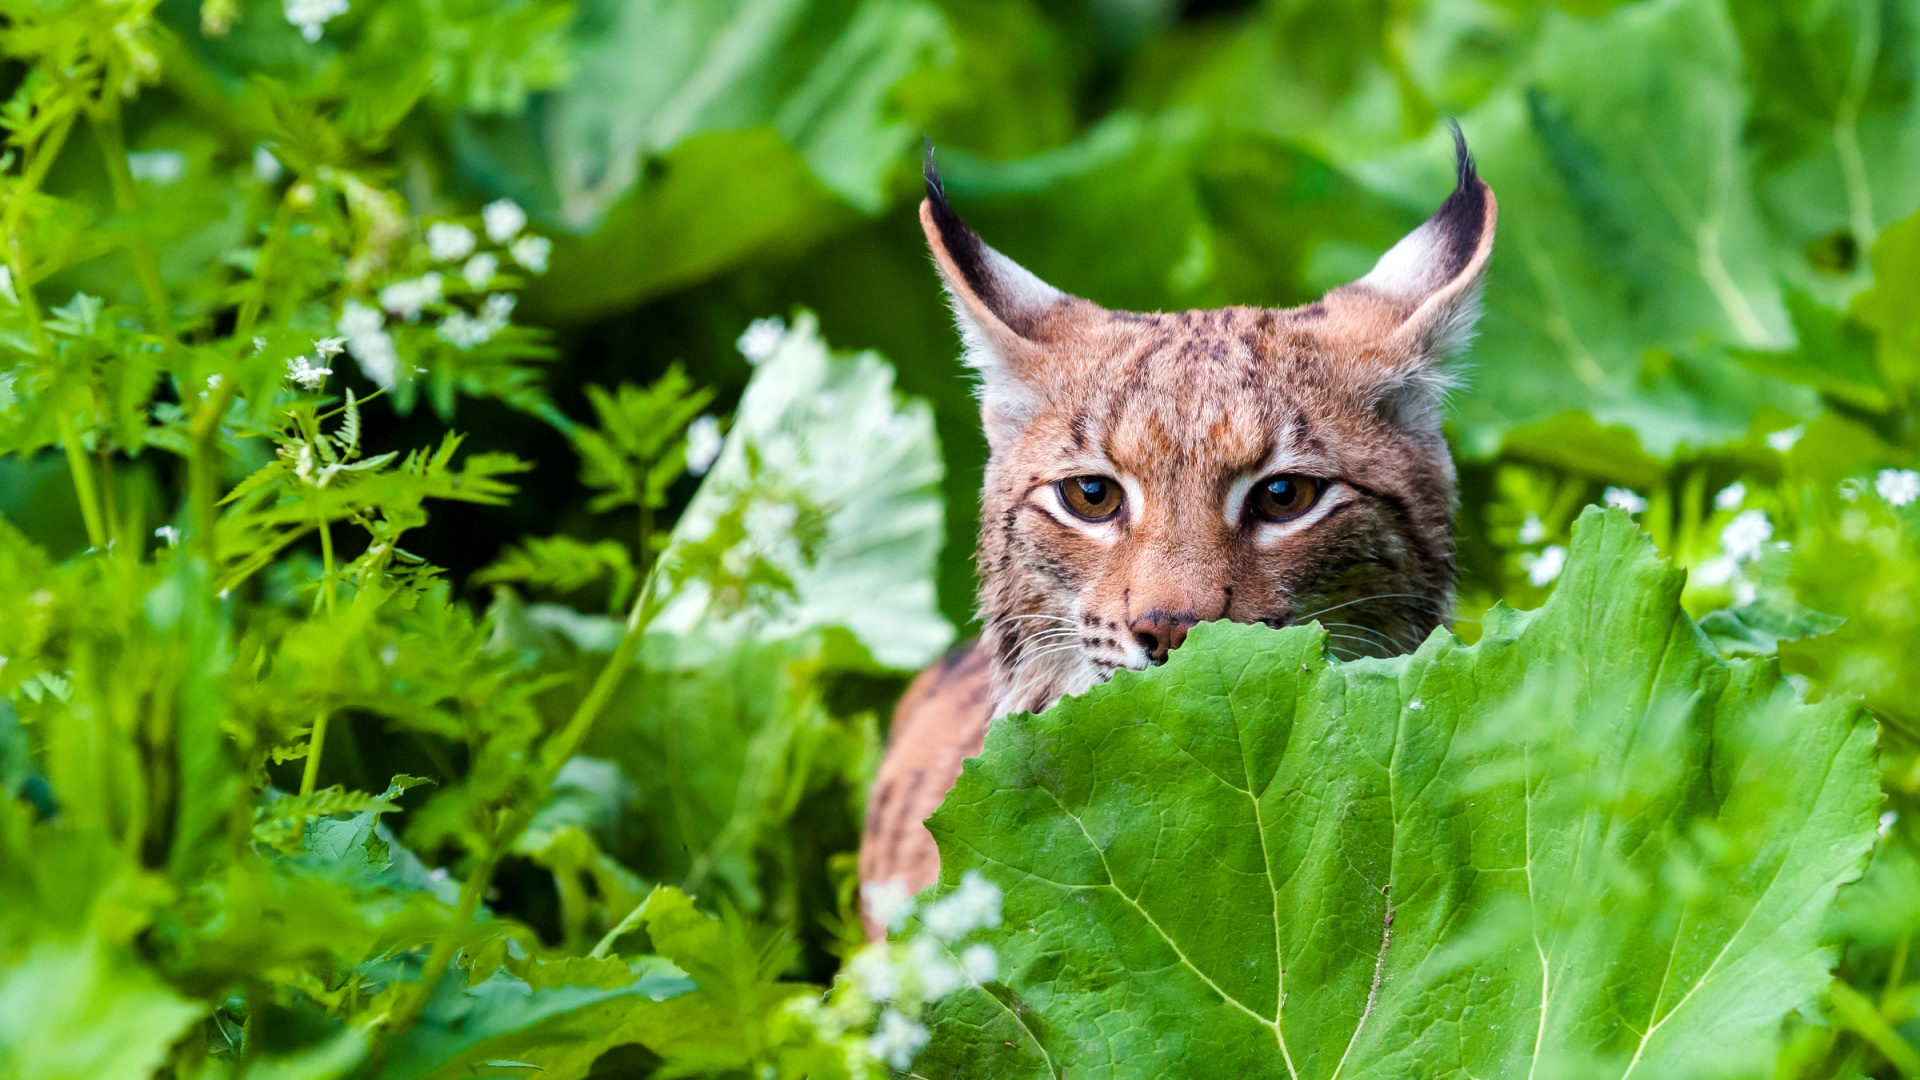 eurasian-lynx-grass-national-park-slovakia-tomas-hulik-wwf-1920x1080